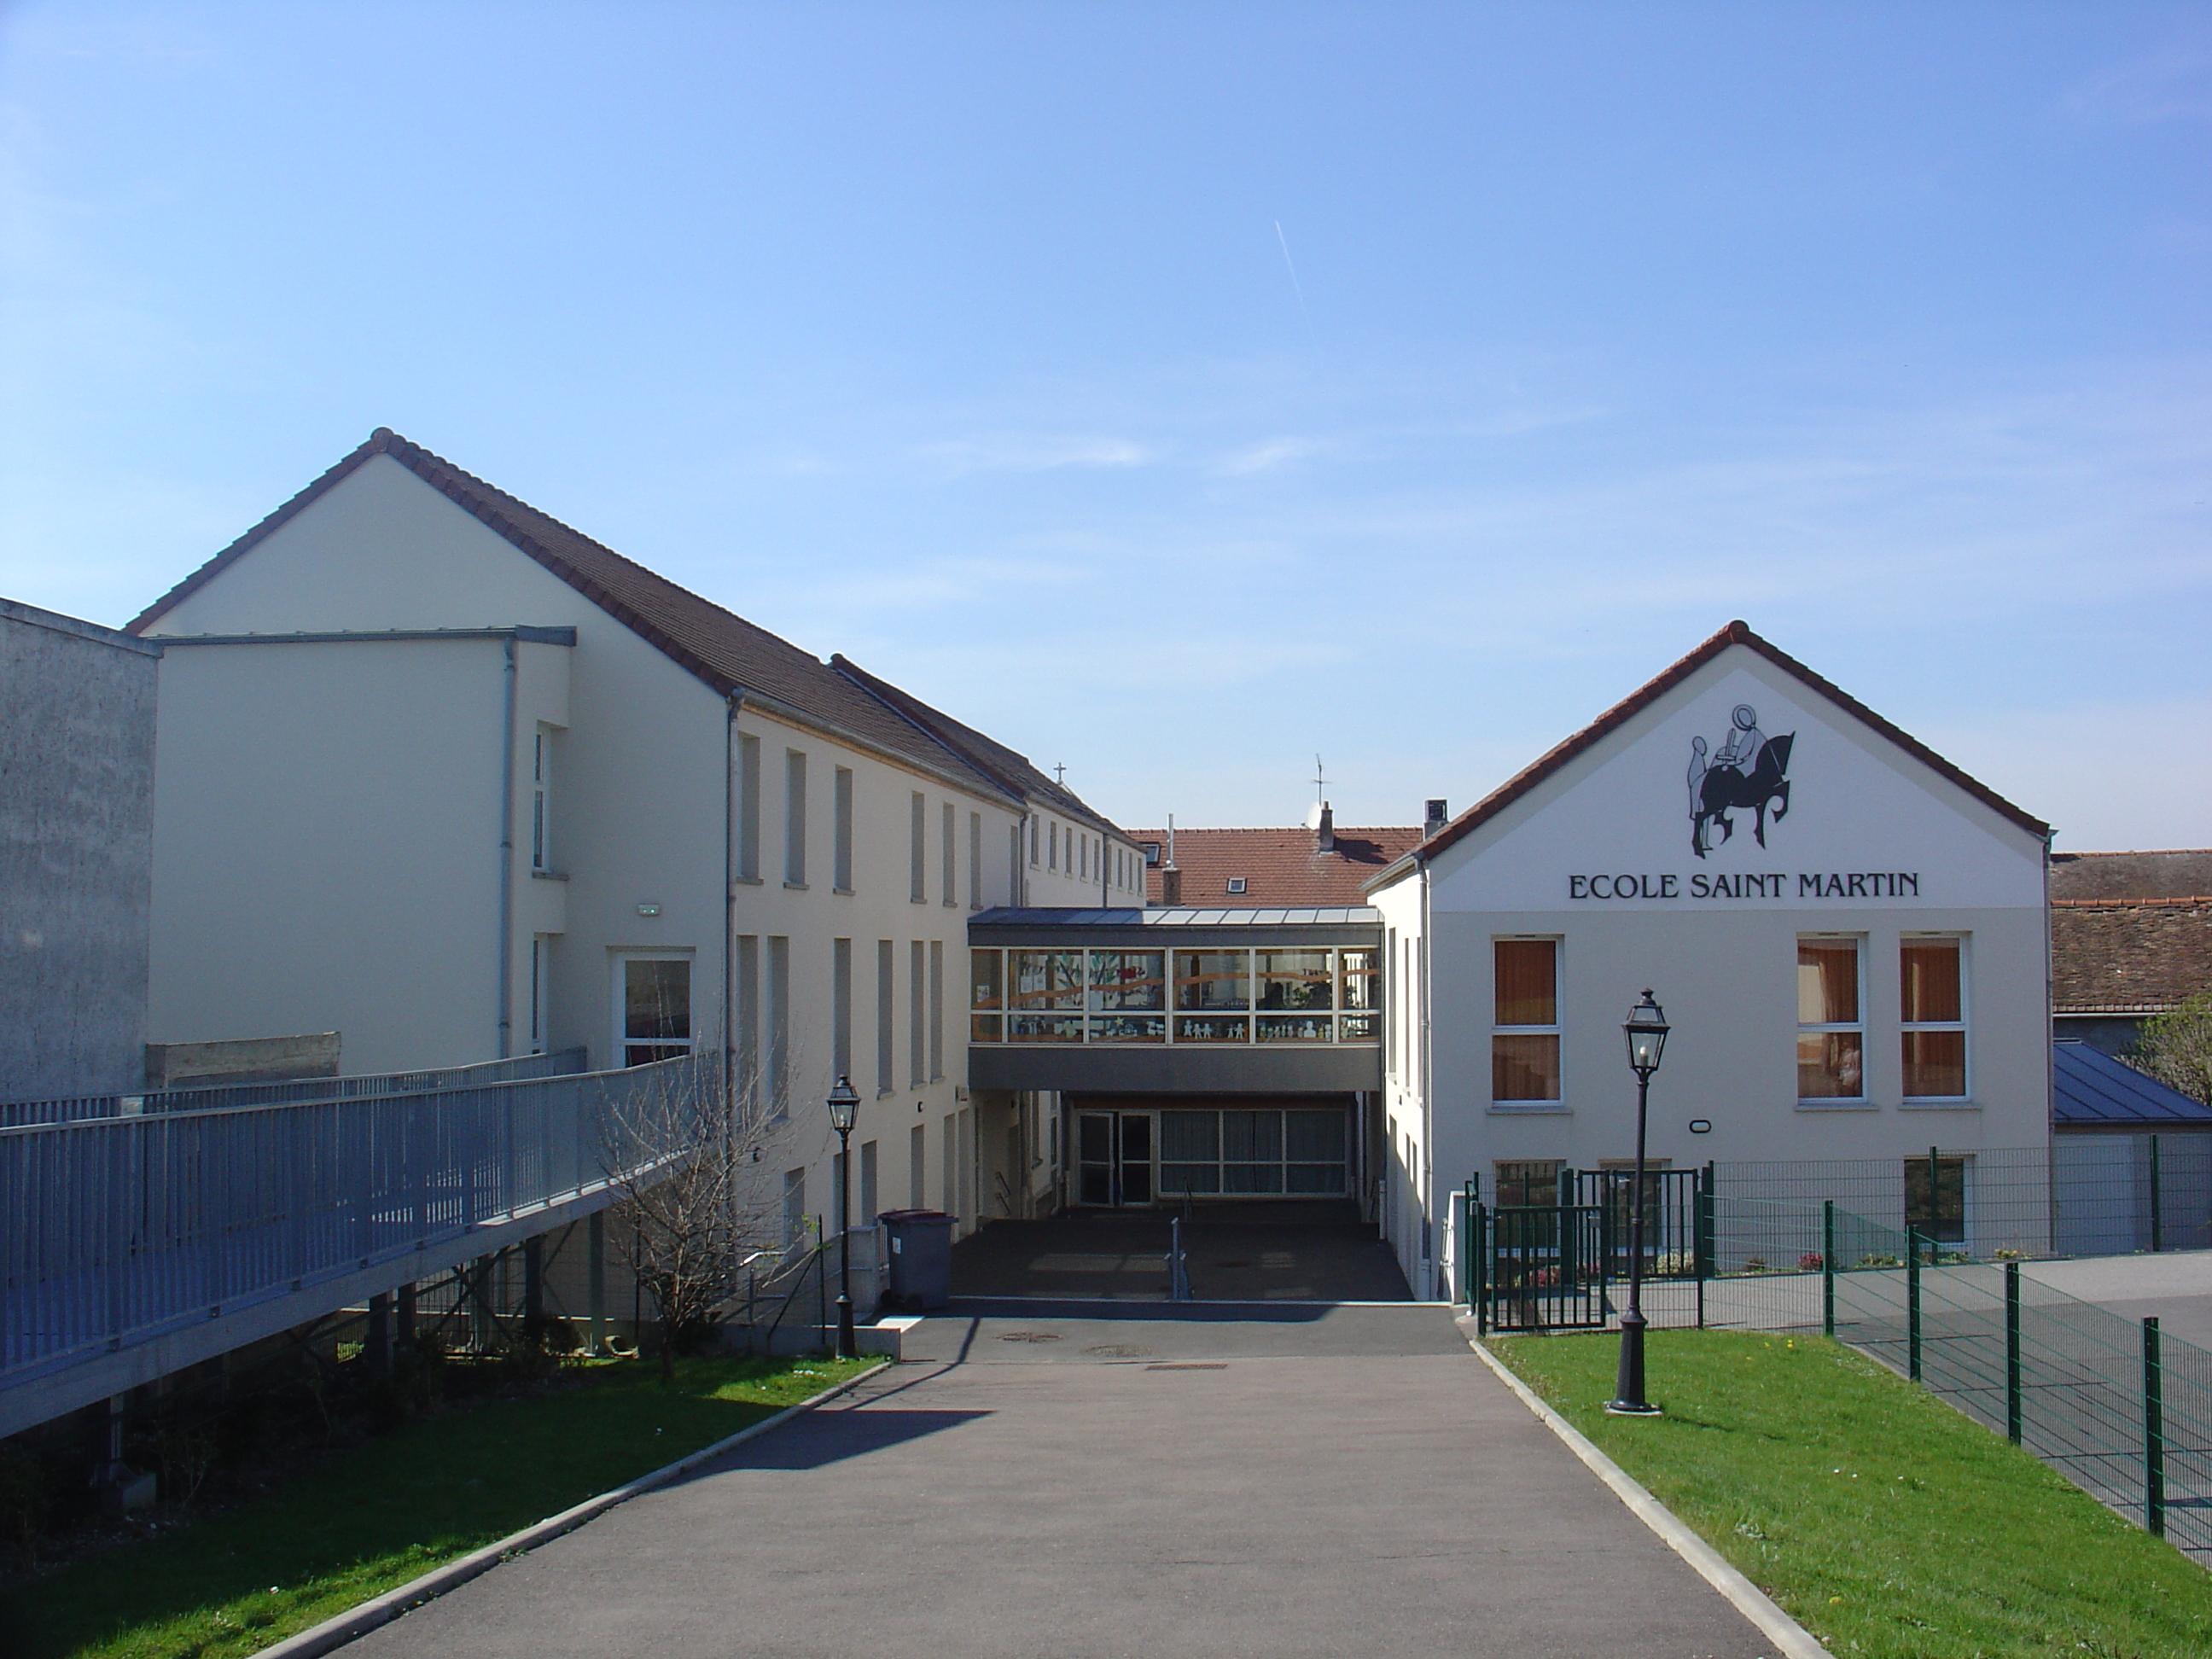 Ecole Saint Martin